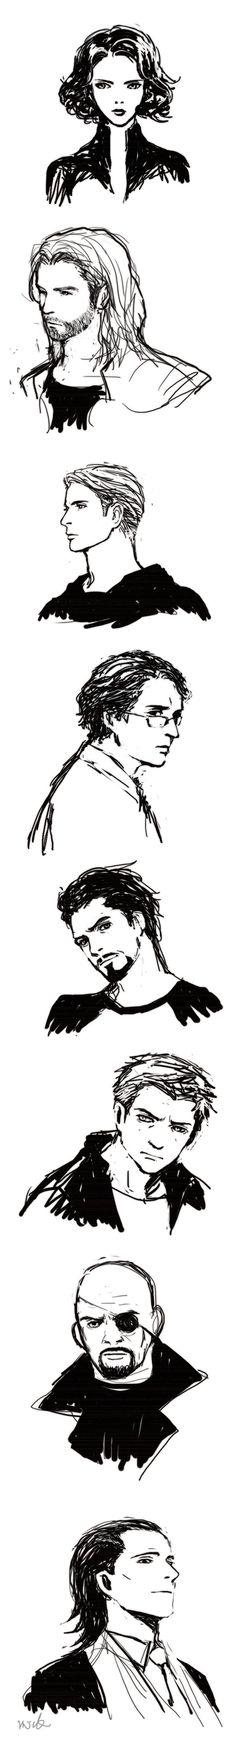 Avengers (Sketch) by mick347.deviantart.com on @deviantART. I love the ones for Thor, Tony, and especially Loki.